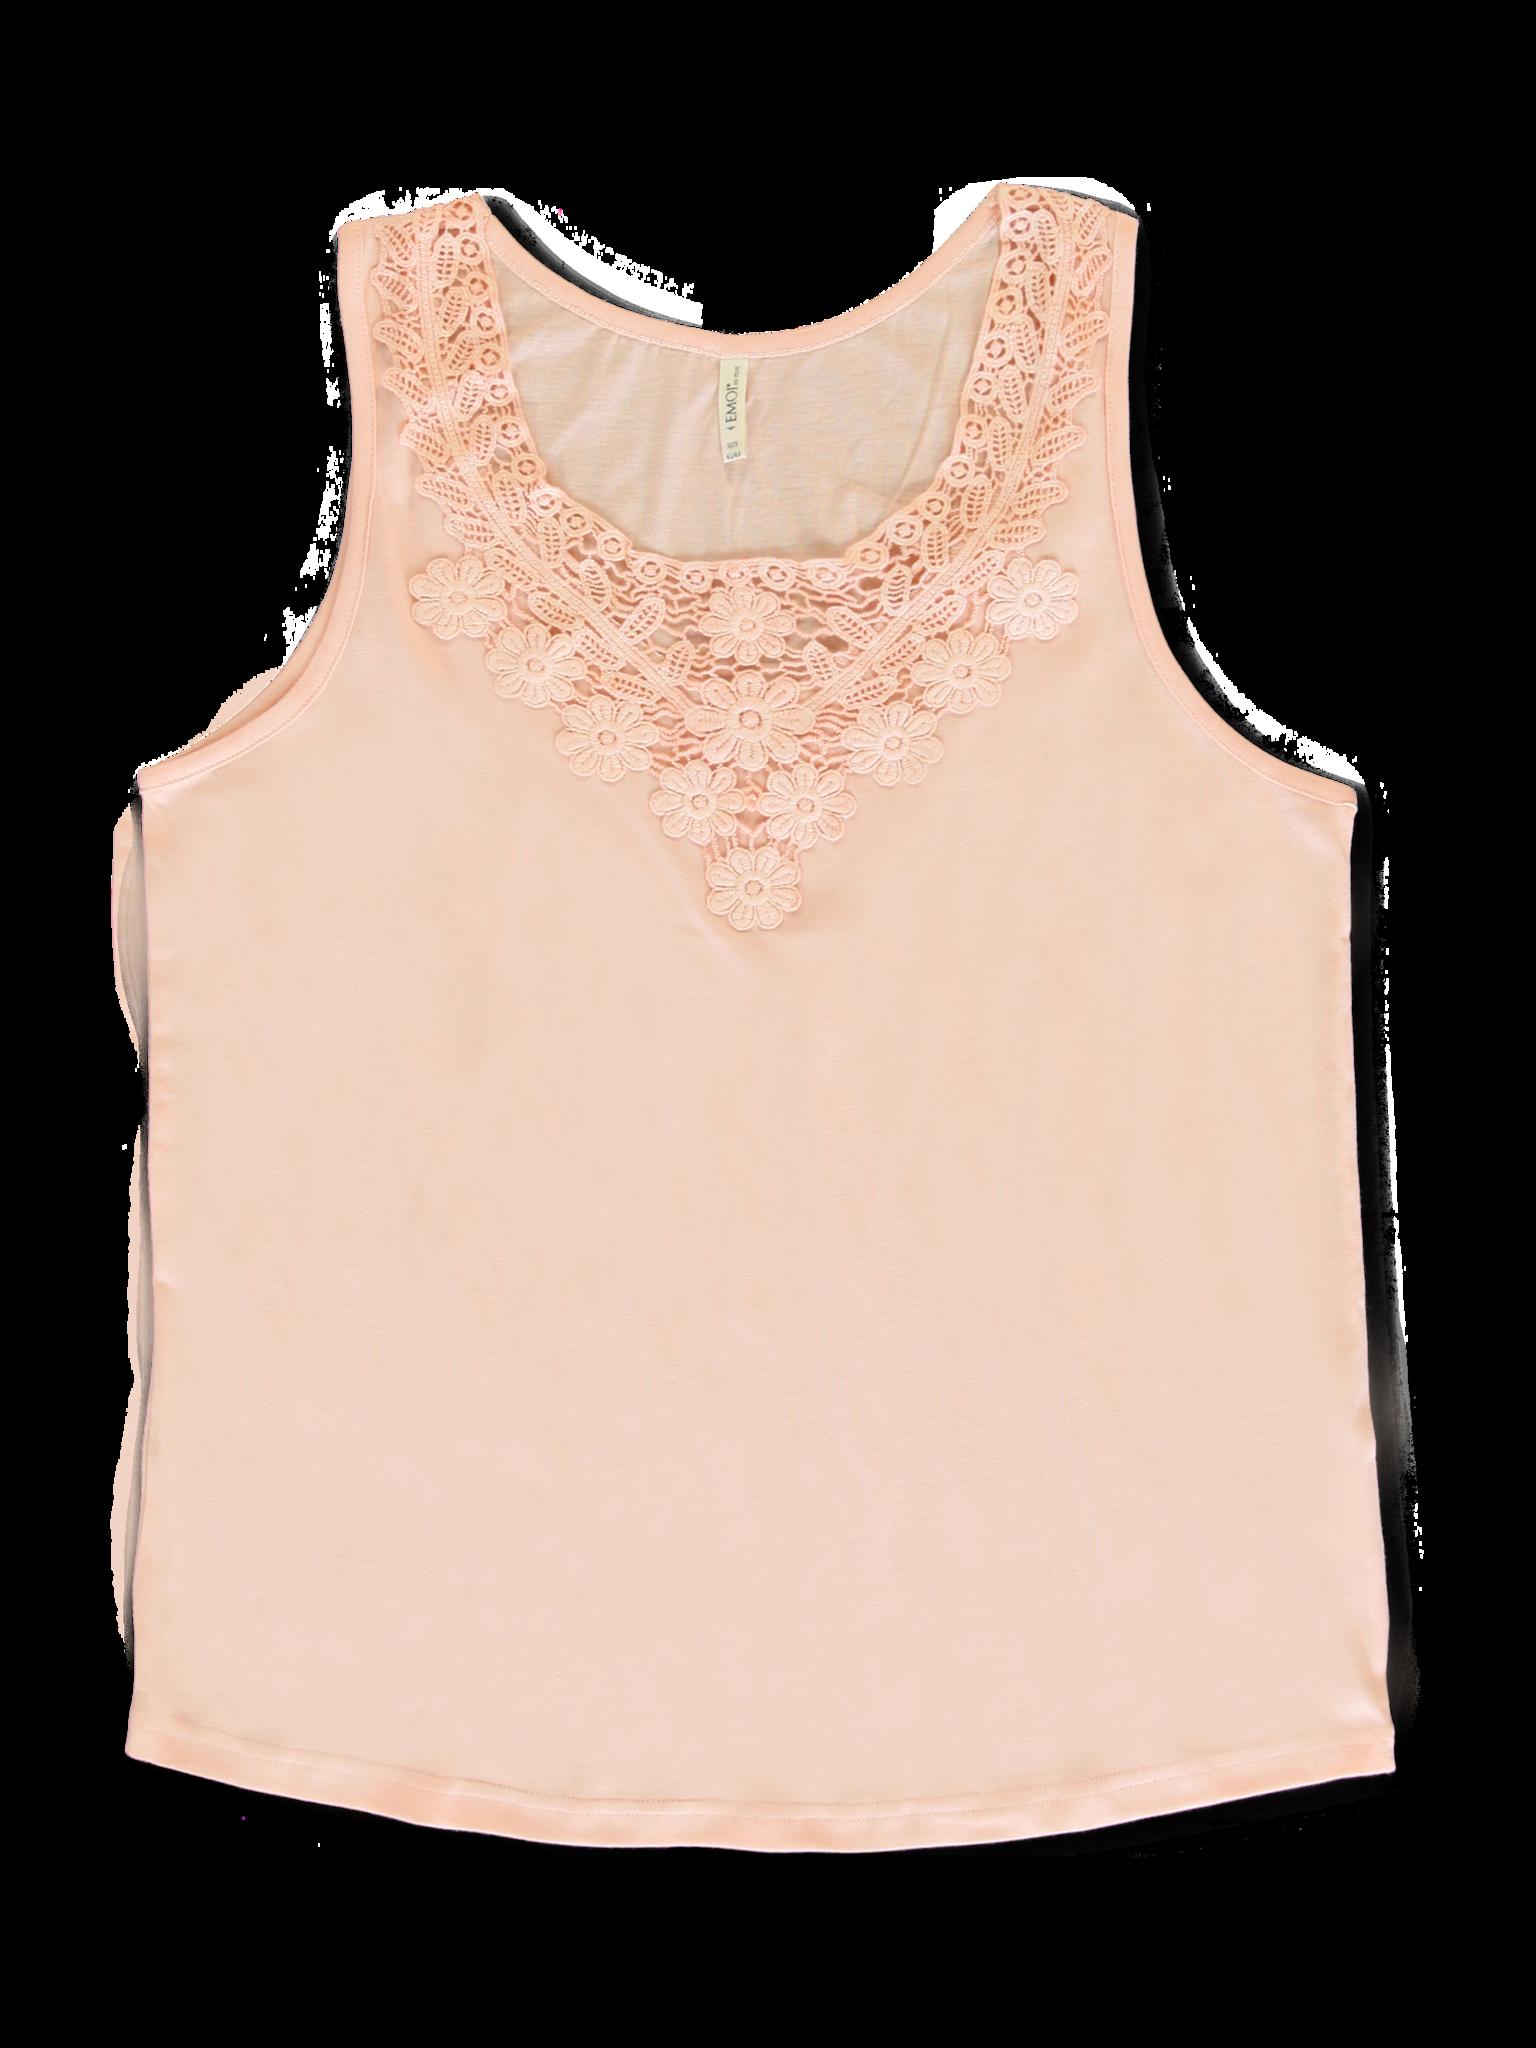 All Brands | Summerproducts Ladies+ | Singlet | 24 pcs/box